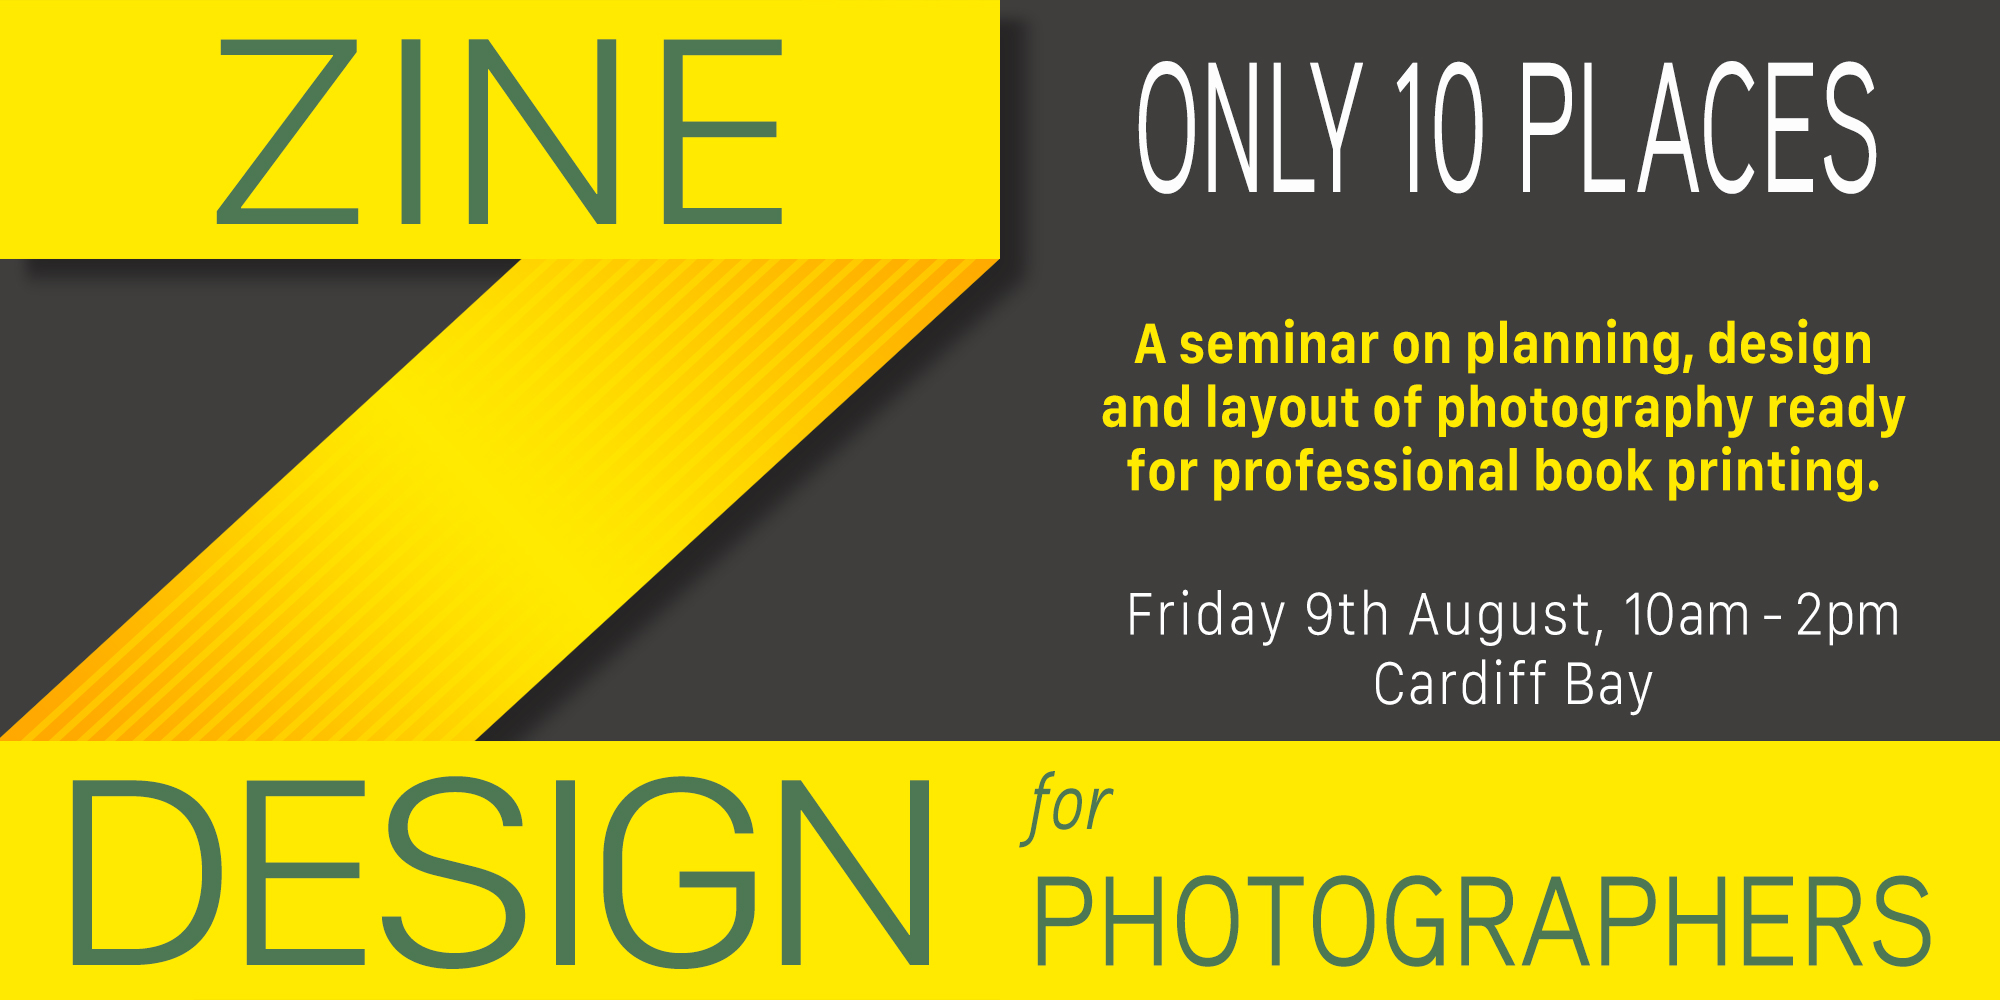 zine seminar_0819 poster.jpg